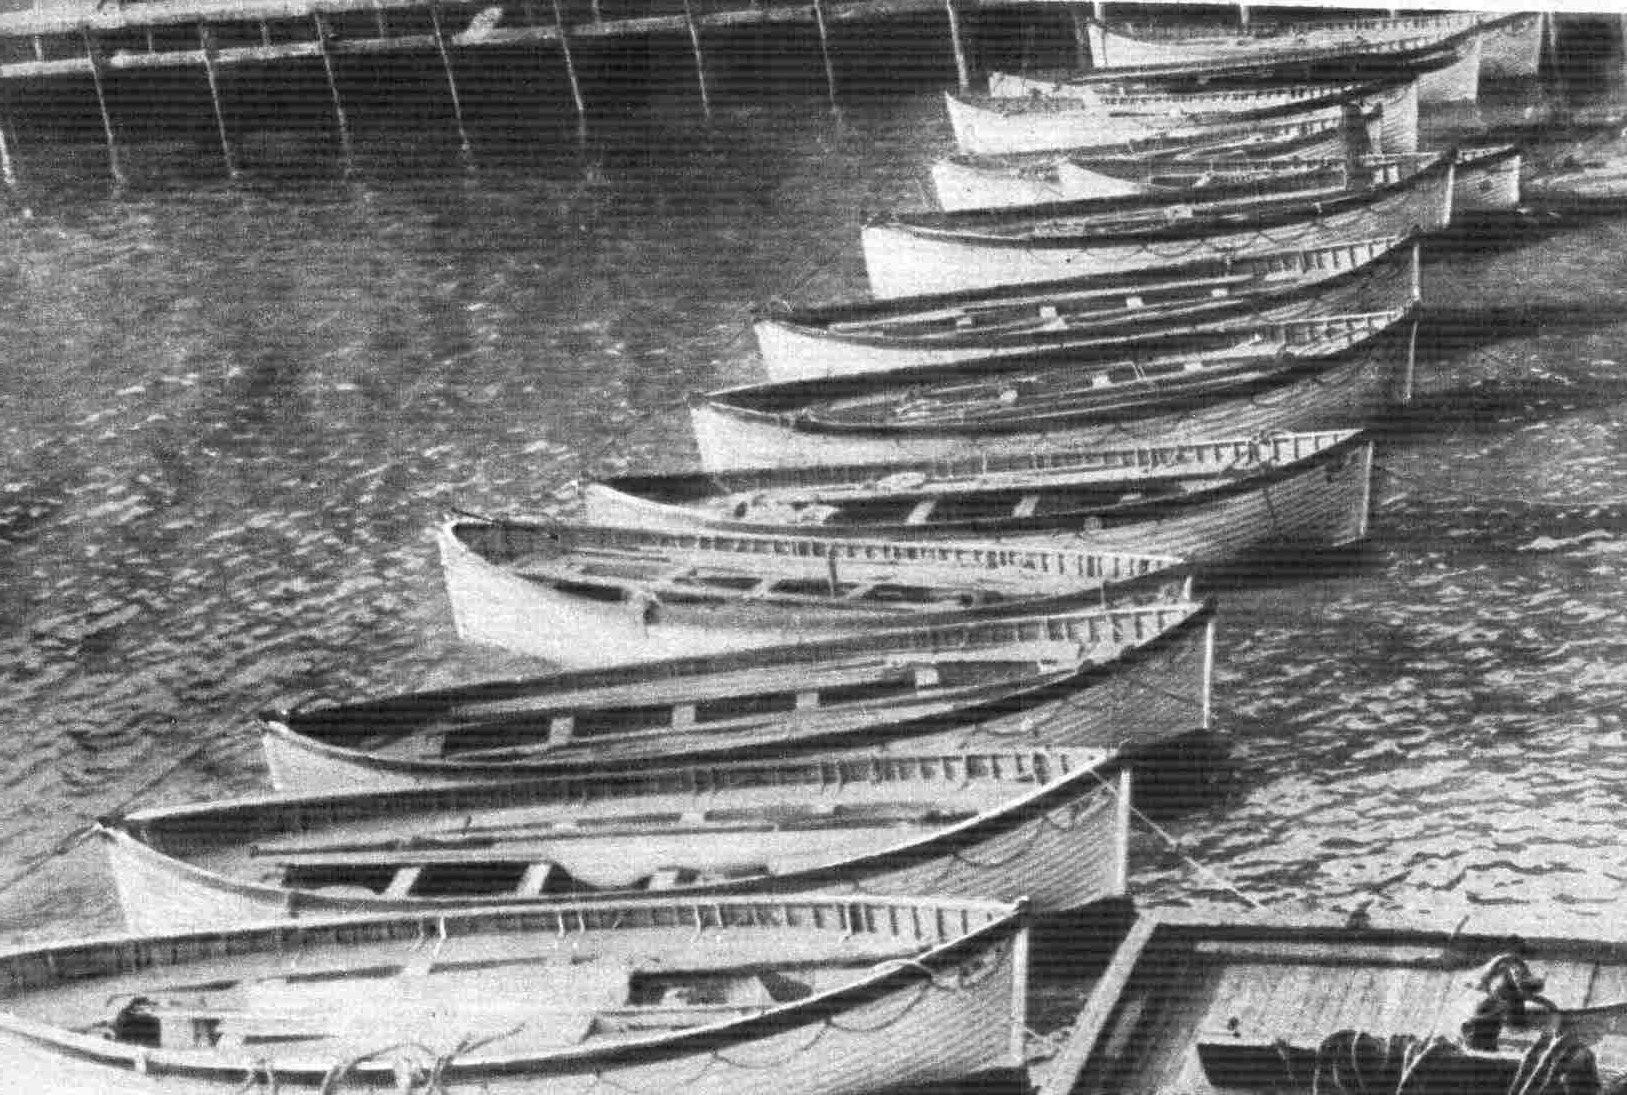 filetitanic life boats recoveredjpg wikimedia commons